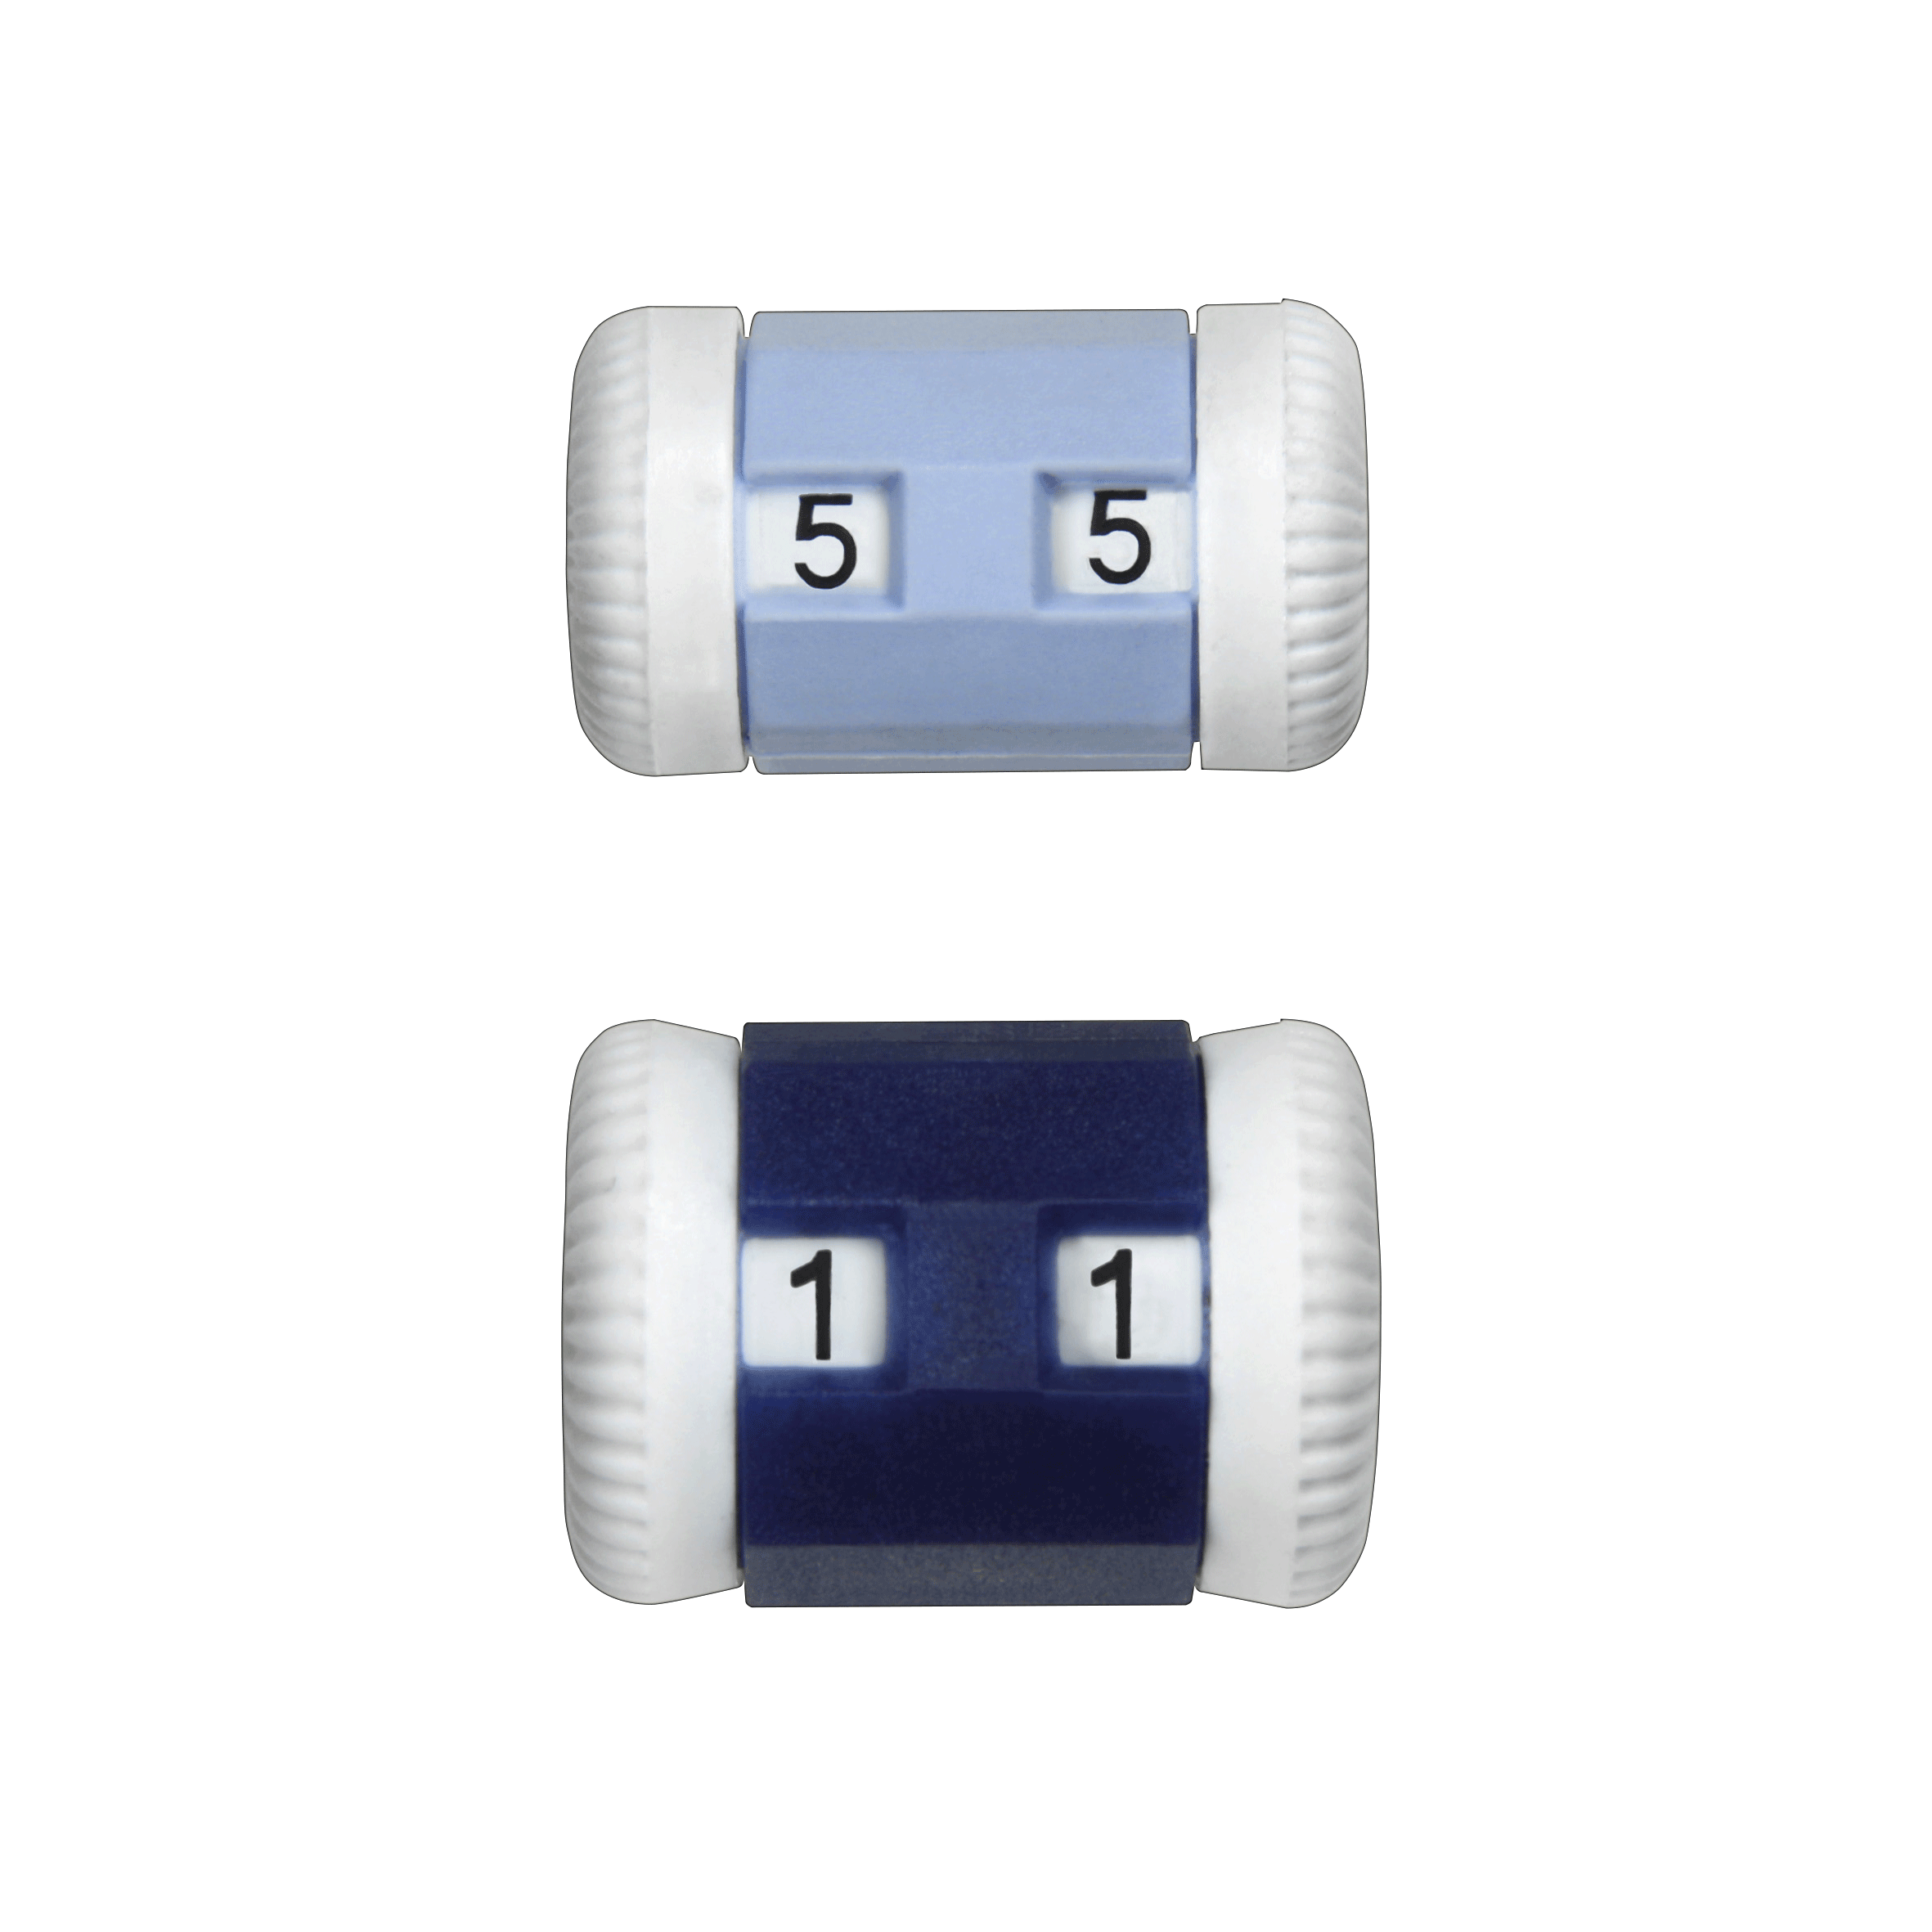 414-7 Row Counters